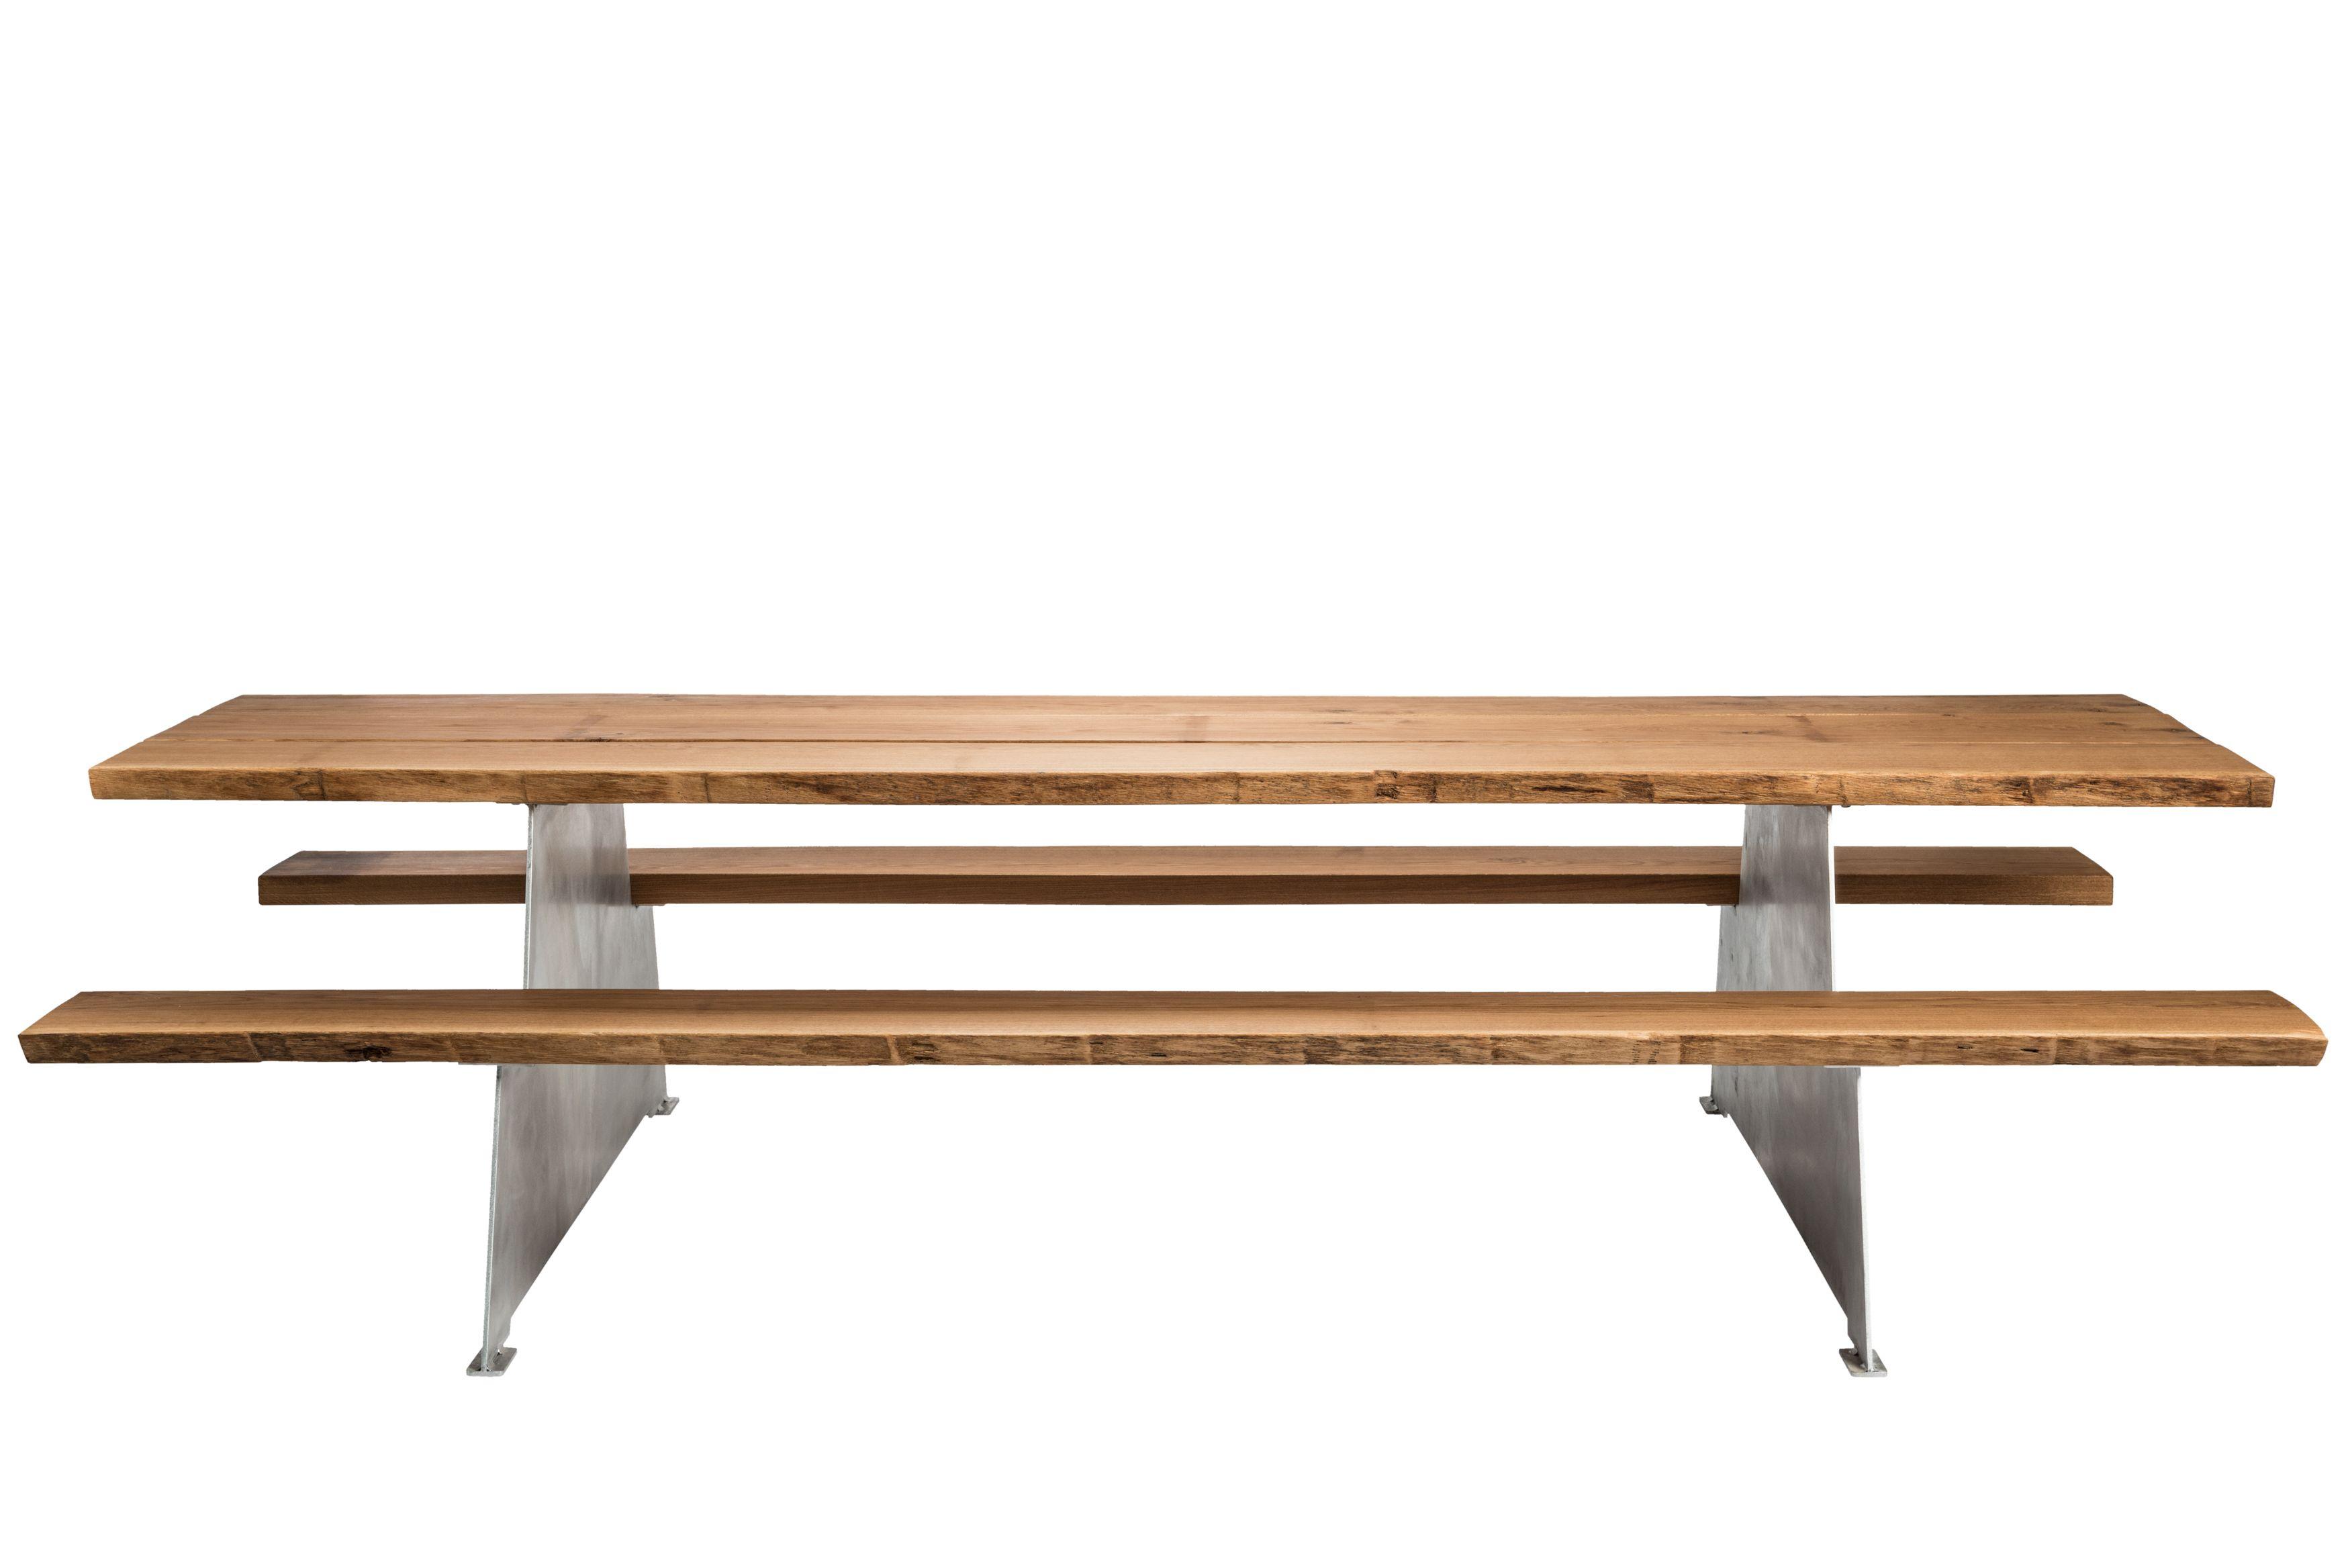 Luxurious Design Picnic Table In Oak Wood And Aluminium Design